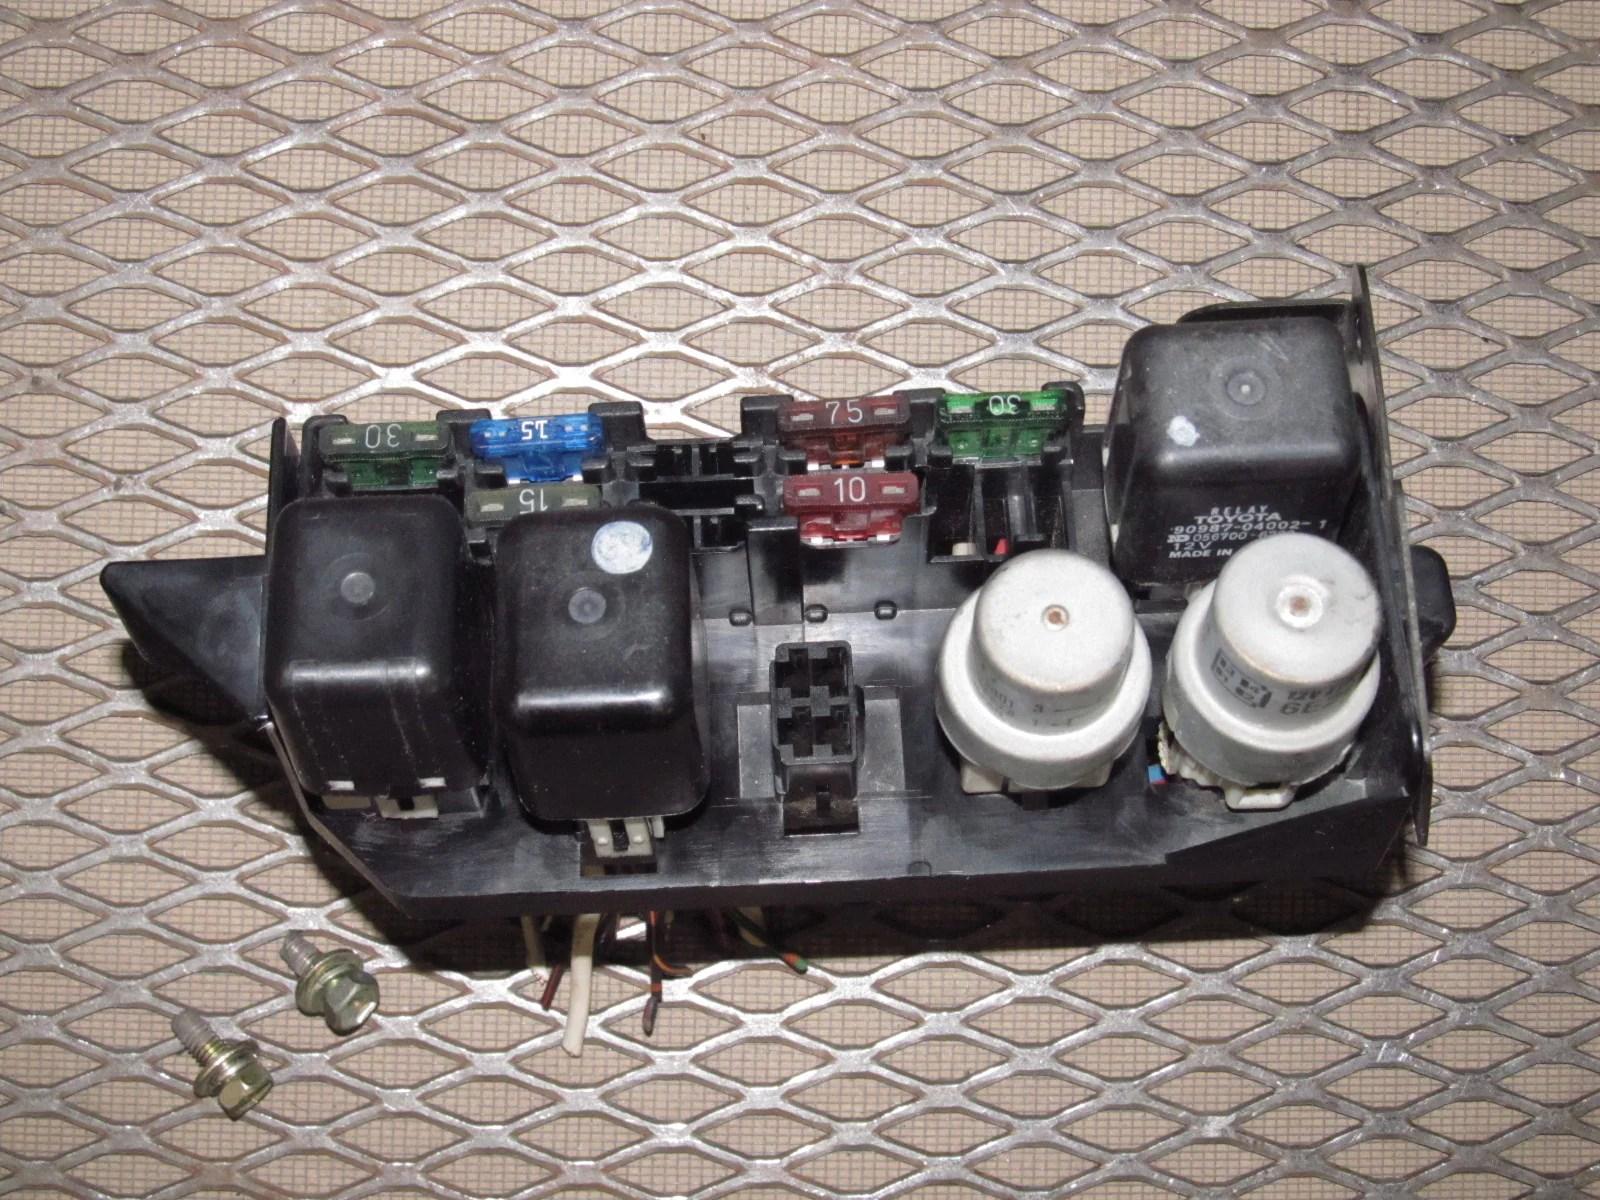 toyota mr2 mk1 fuse box wiring diagram centremr2 fuse box wiring diagram g985 mr2 fuse box [ 1600 x 1200 Pixel ]